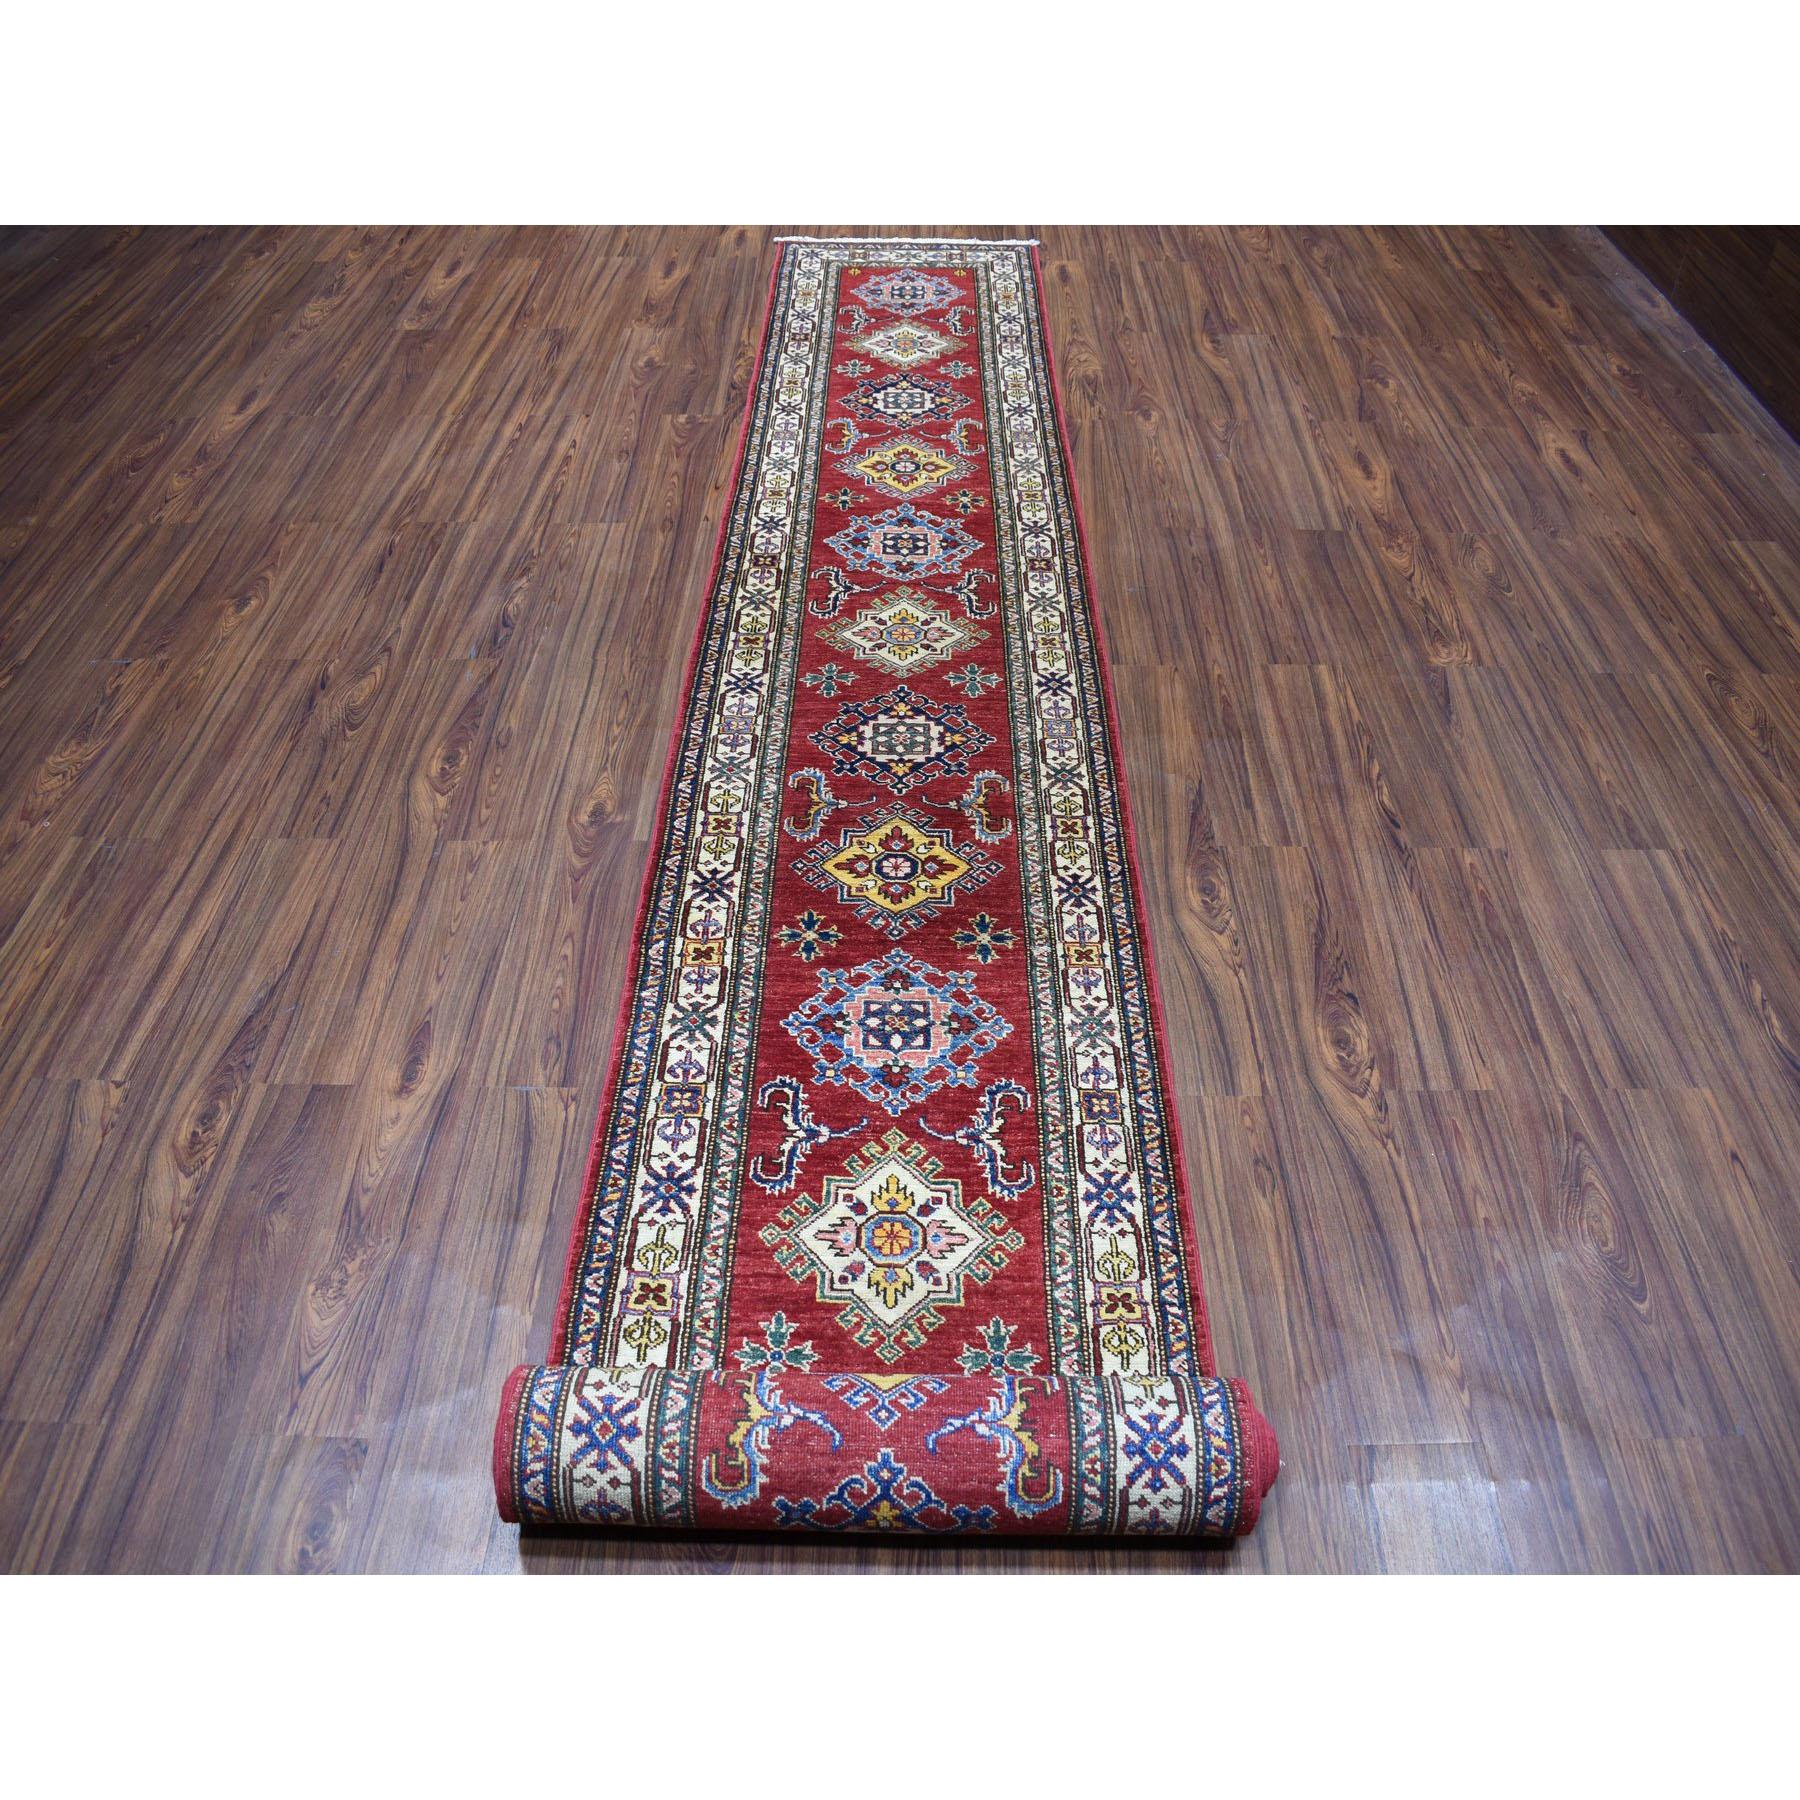 "2'5""x20'3"" Red Super Kazak Geometric Design XL Runner Pure Wool Hand-Knotted Oriental Rug"